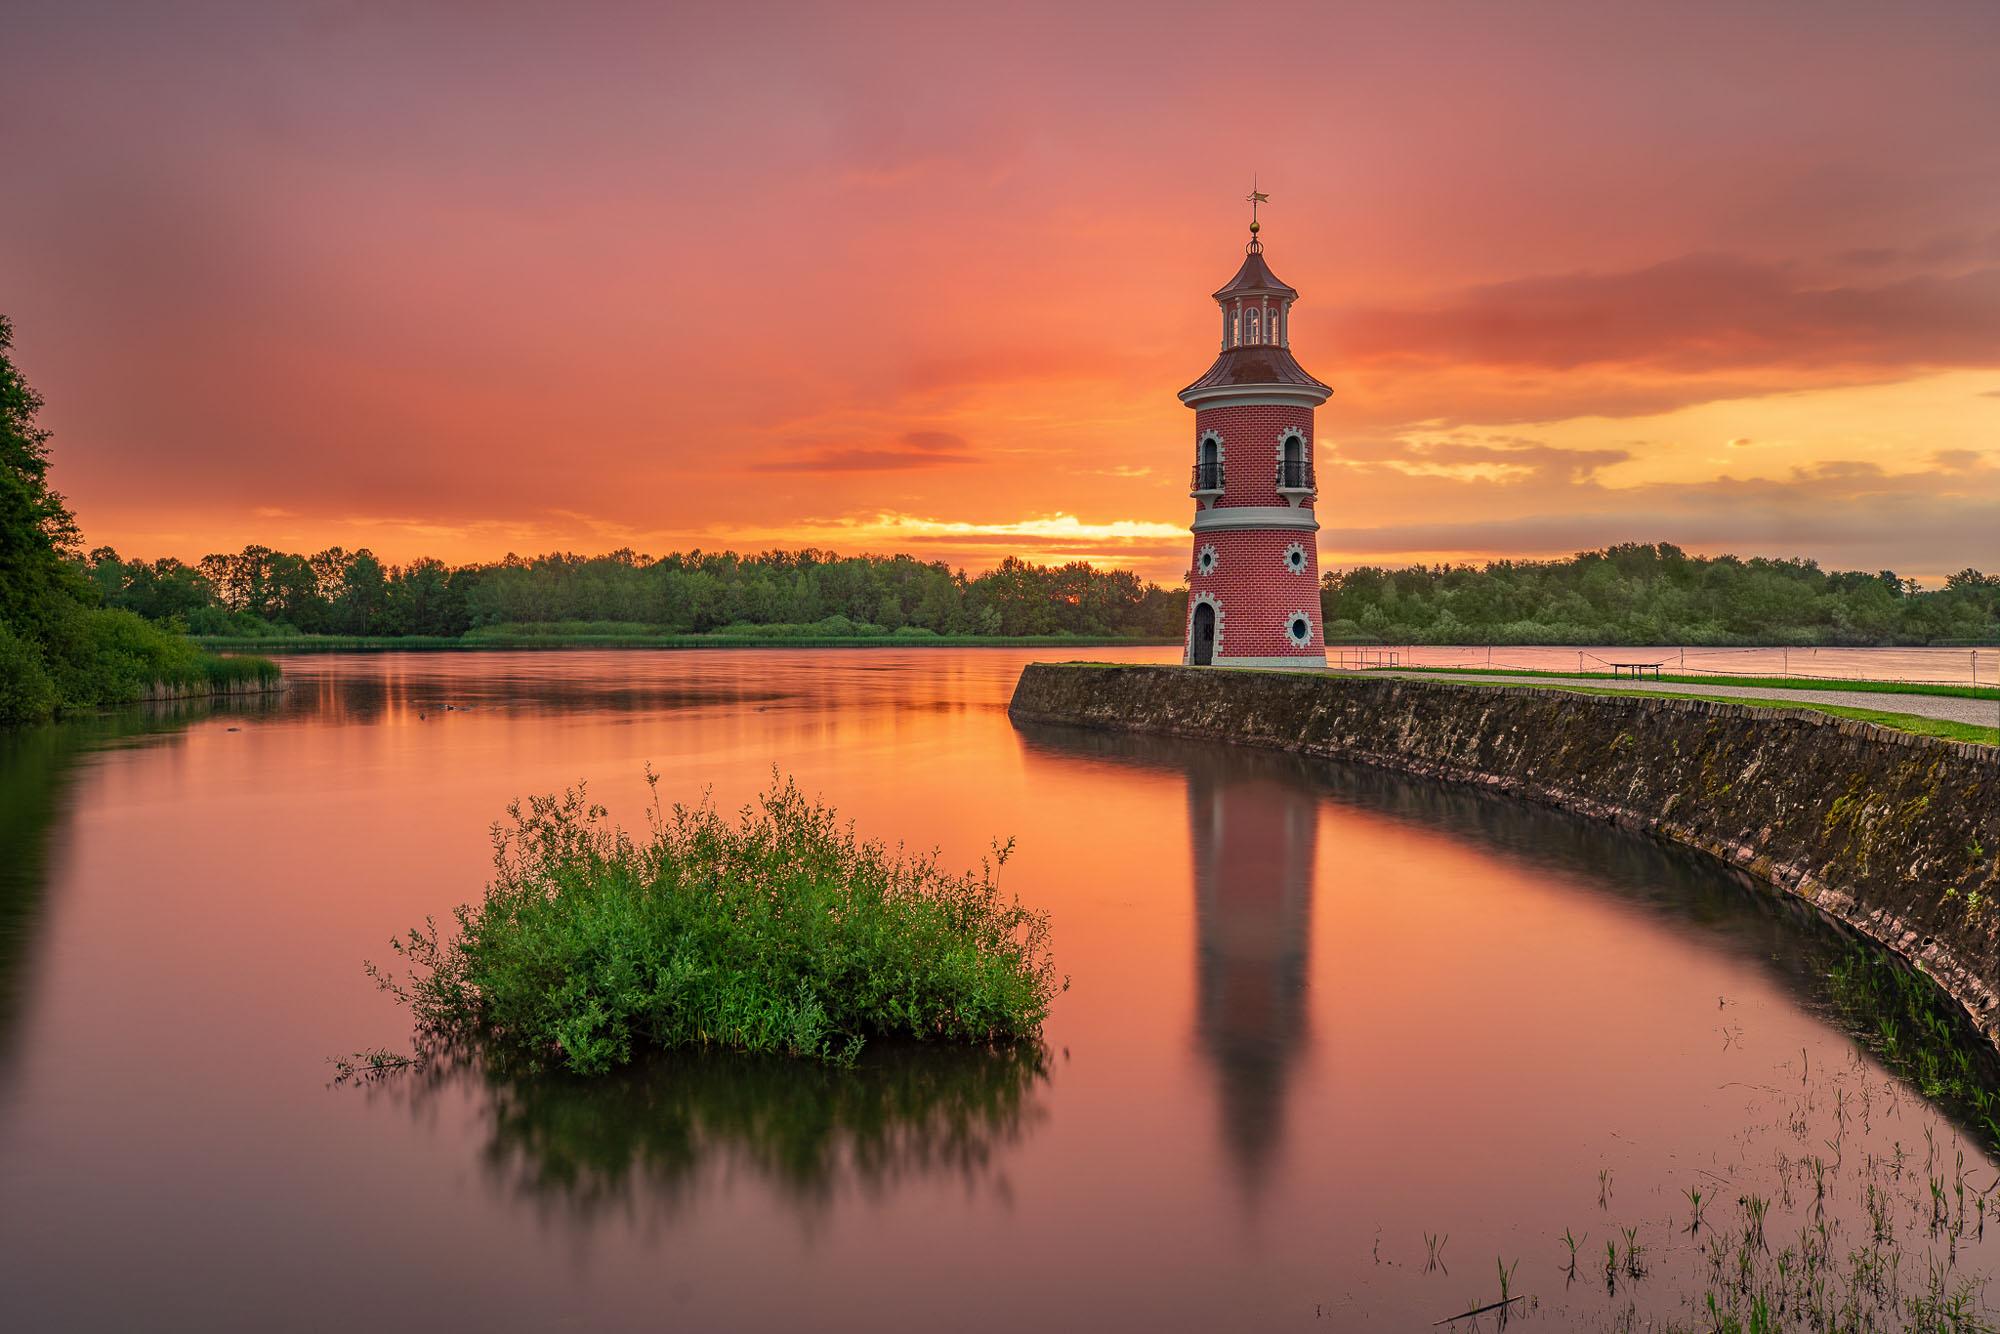 venolab / Moritzburger Leuchtturm